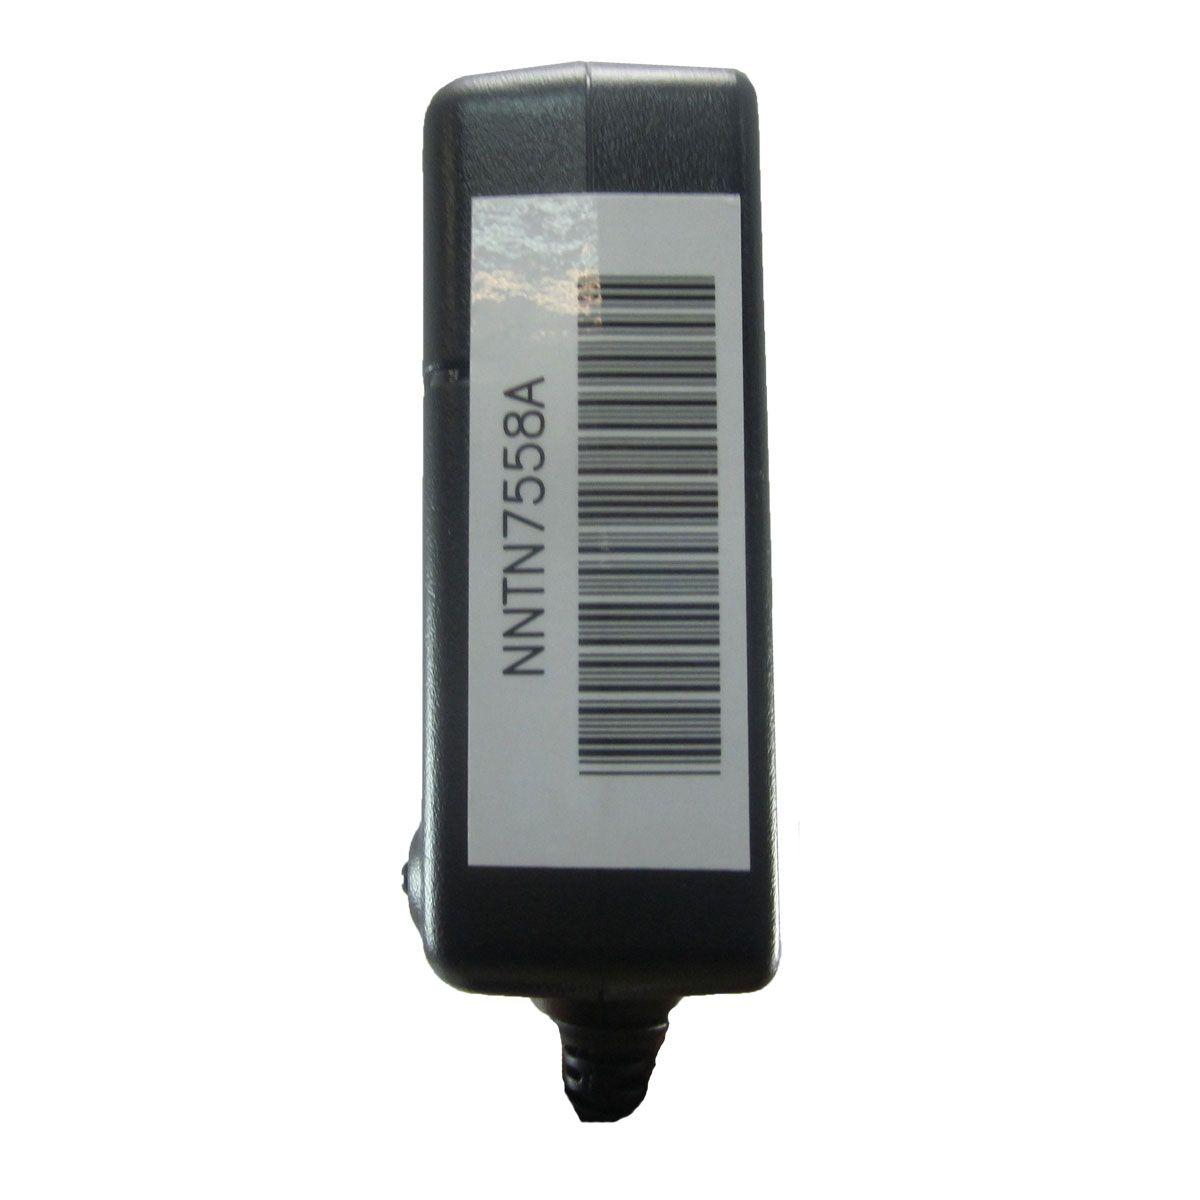 Cargador individual Motorola NNTN7558A para radio MTP850